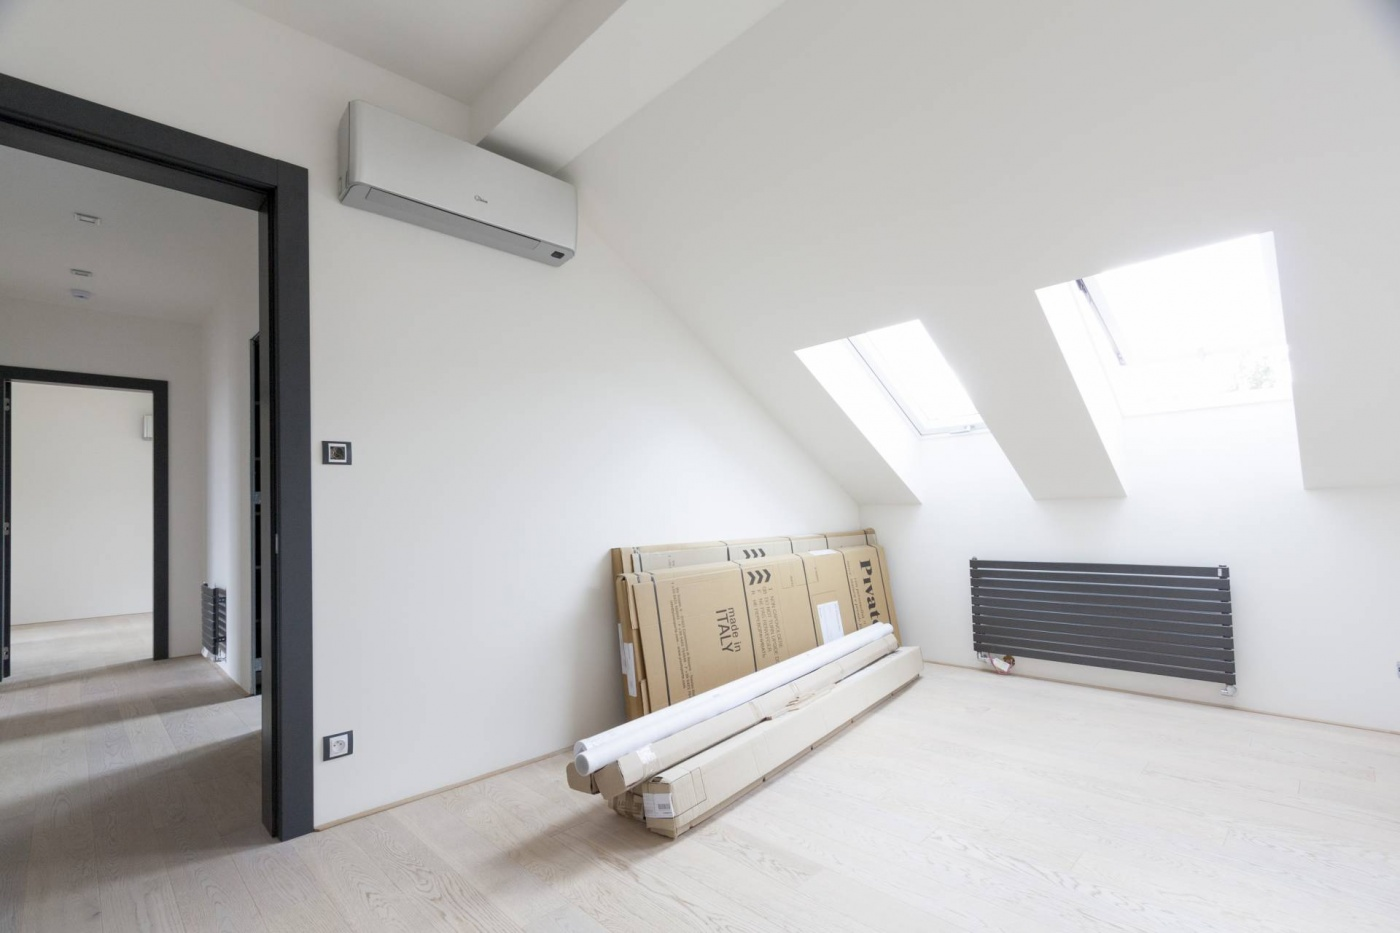 Půdní byt 3+1, plocha 98 m², ulice Lumírova, Praha 2 - Vyšehrad   3